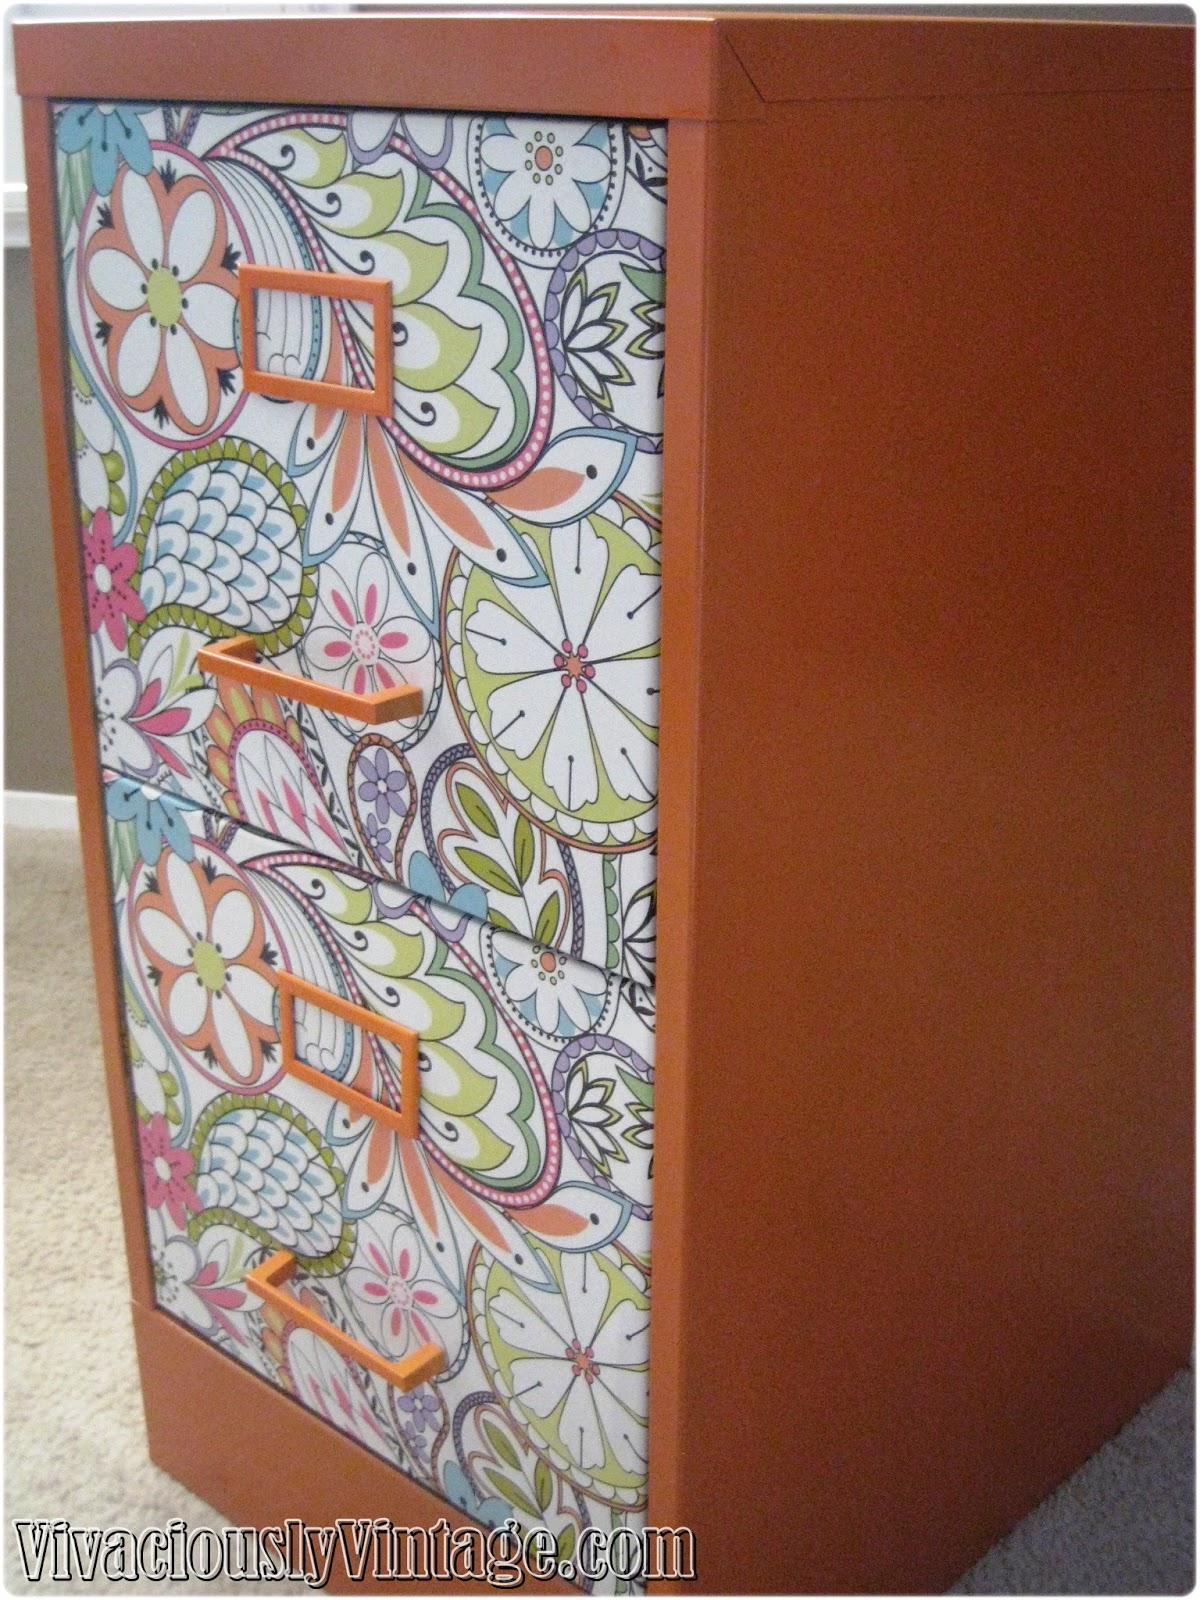 Fun Orange Filing Cabinet For Fall Yu0027all!